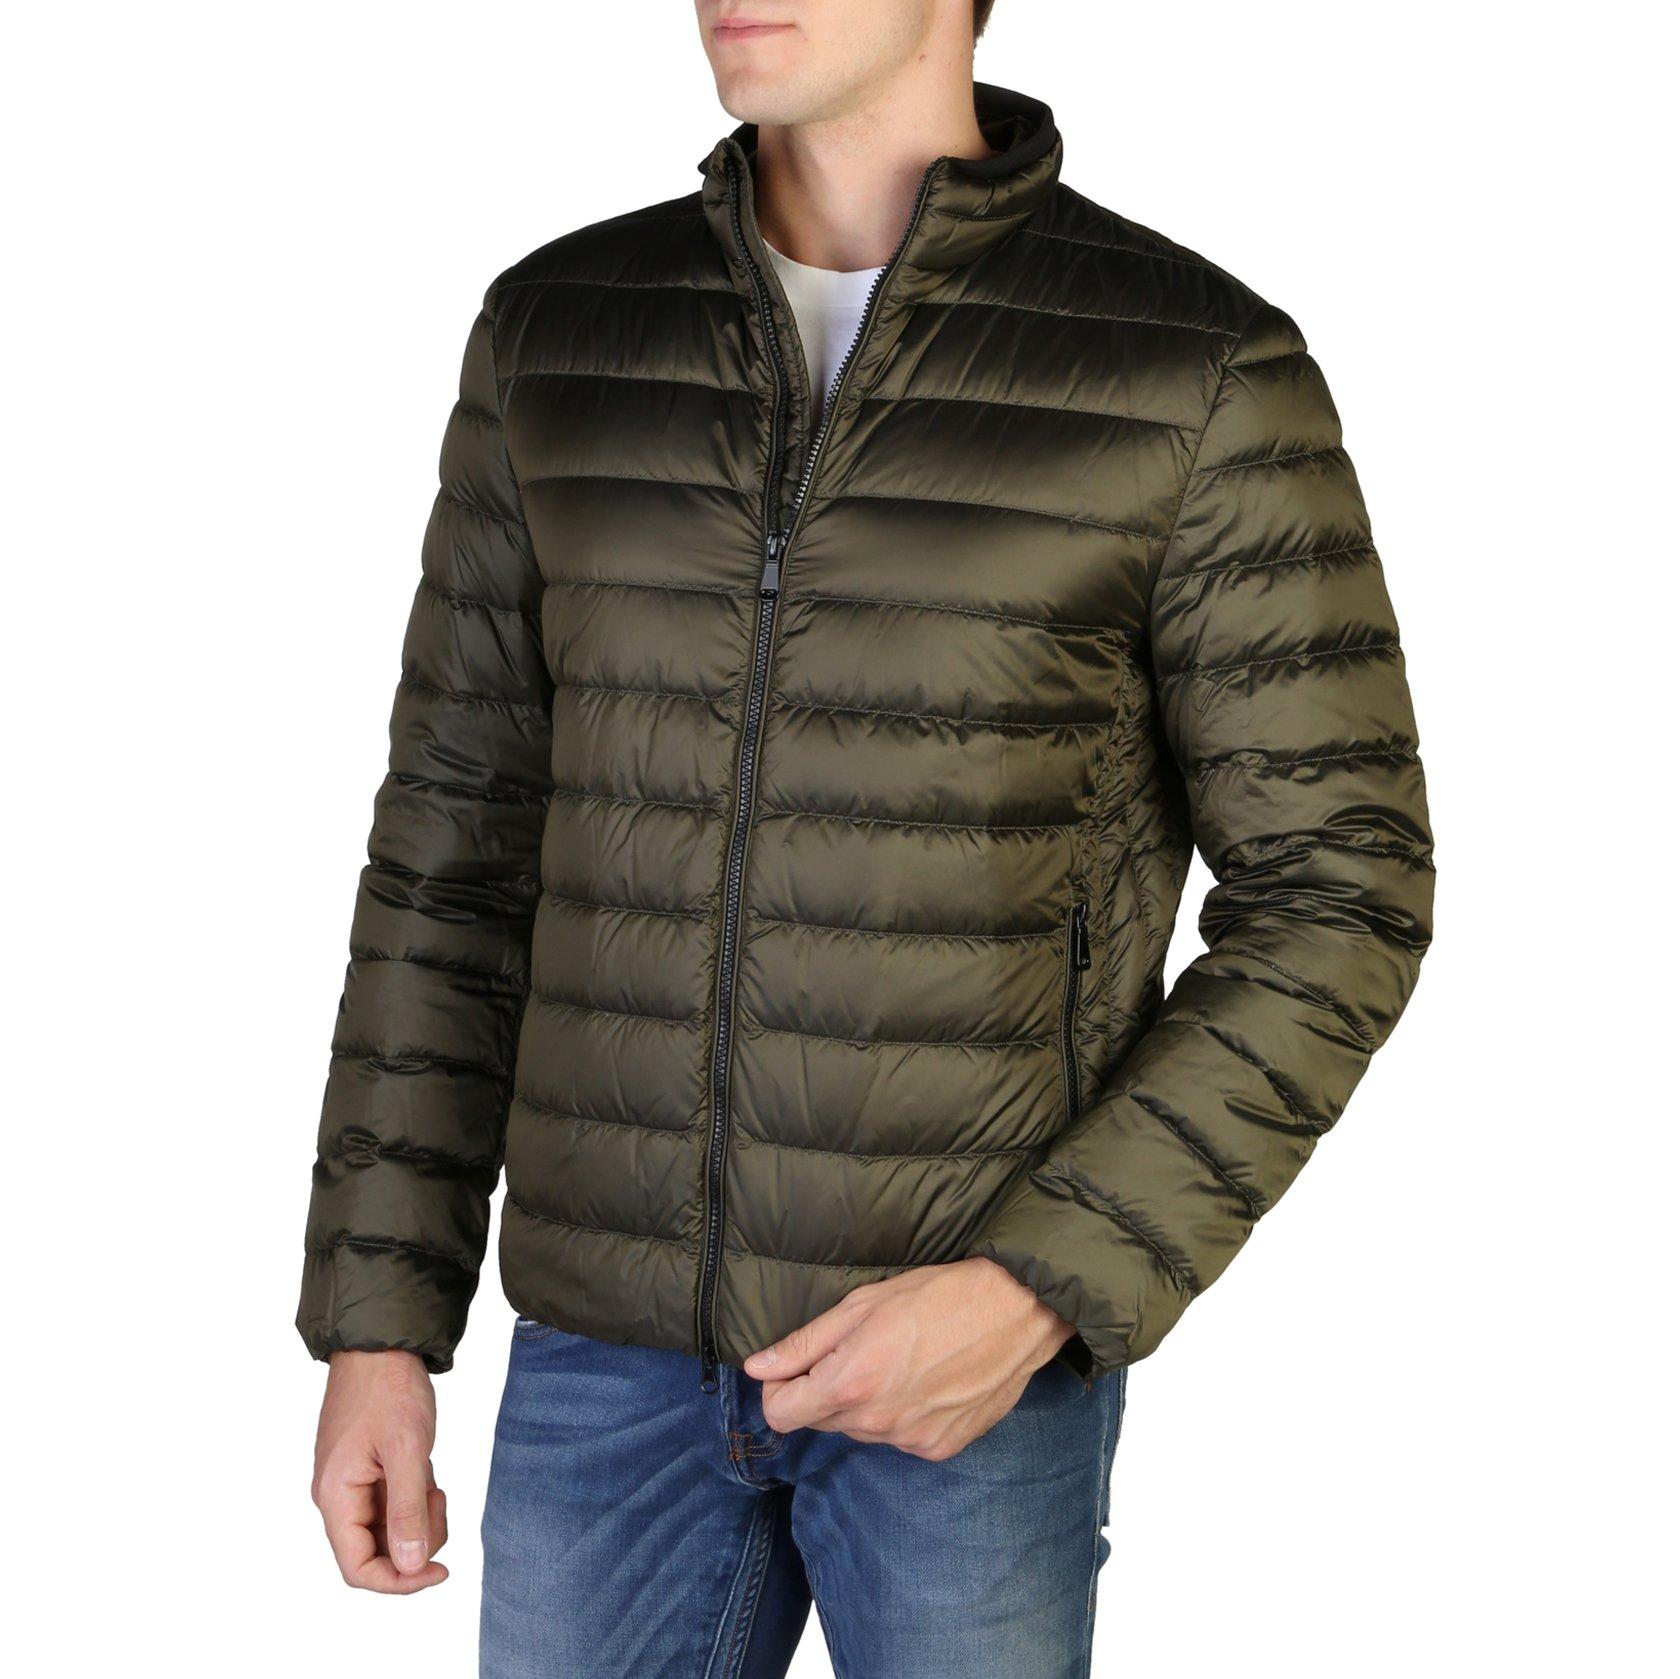 Geox Men's Jacket Blue M9425DT2566 - green 58